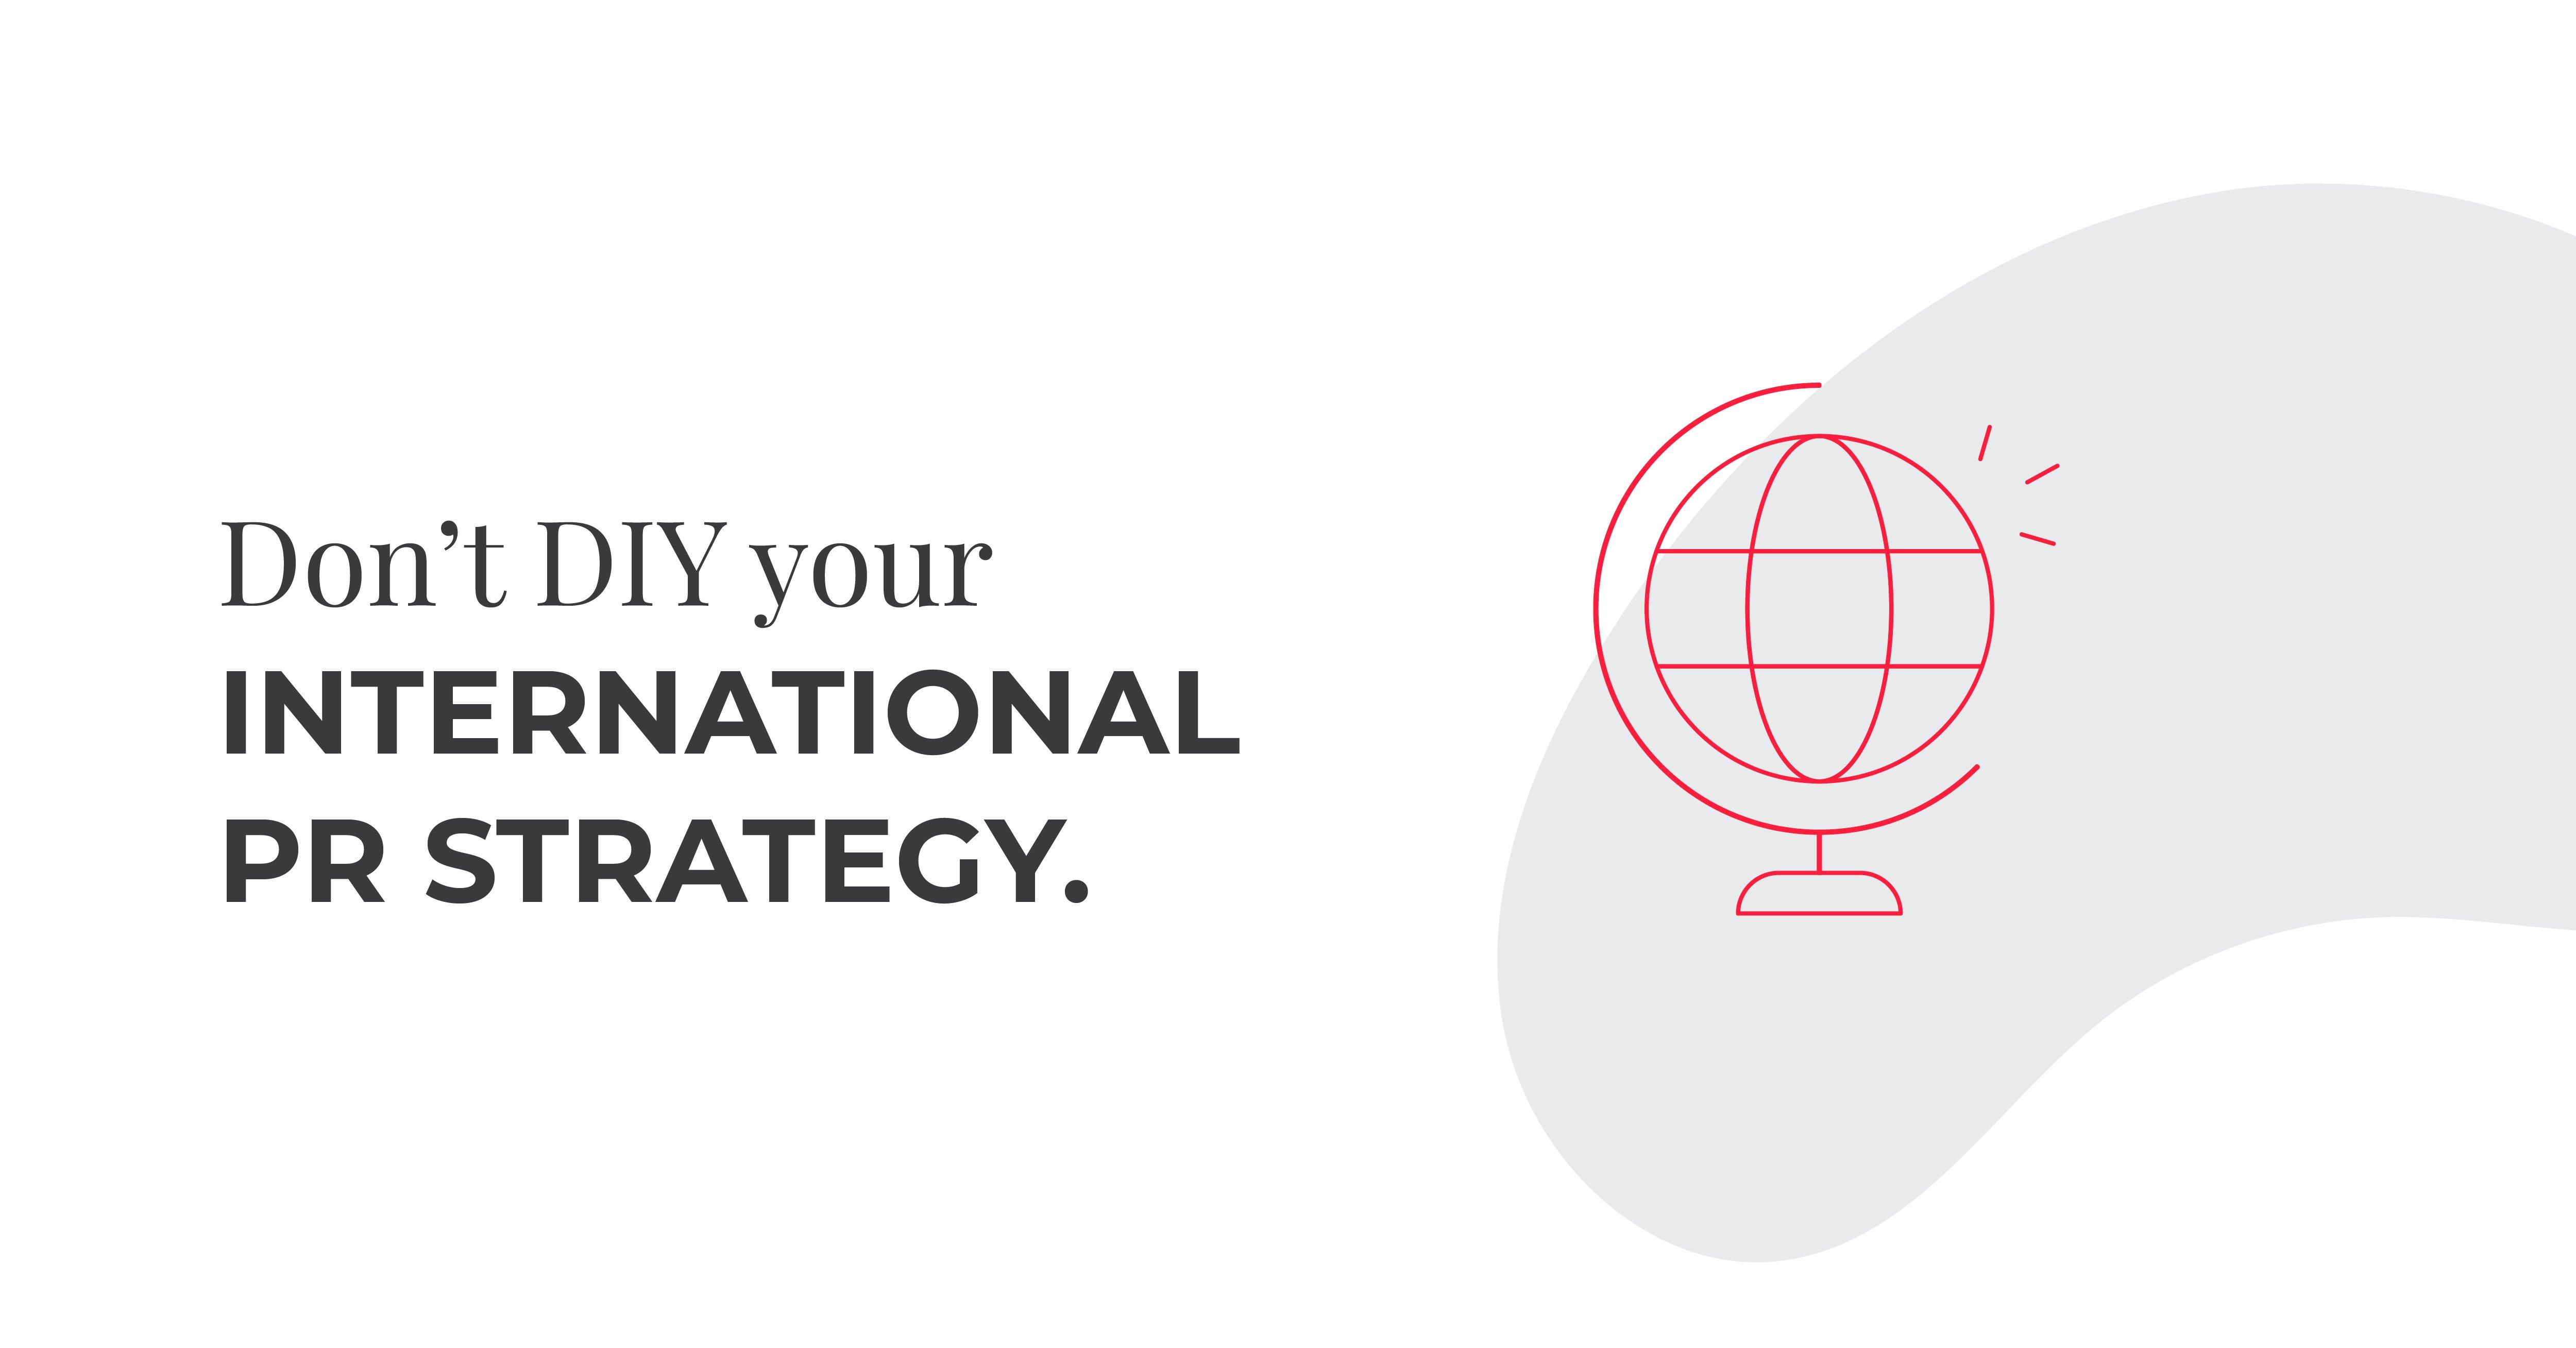 dont DIY your international PR strategy